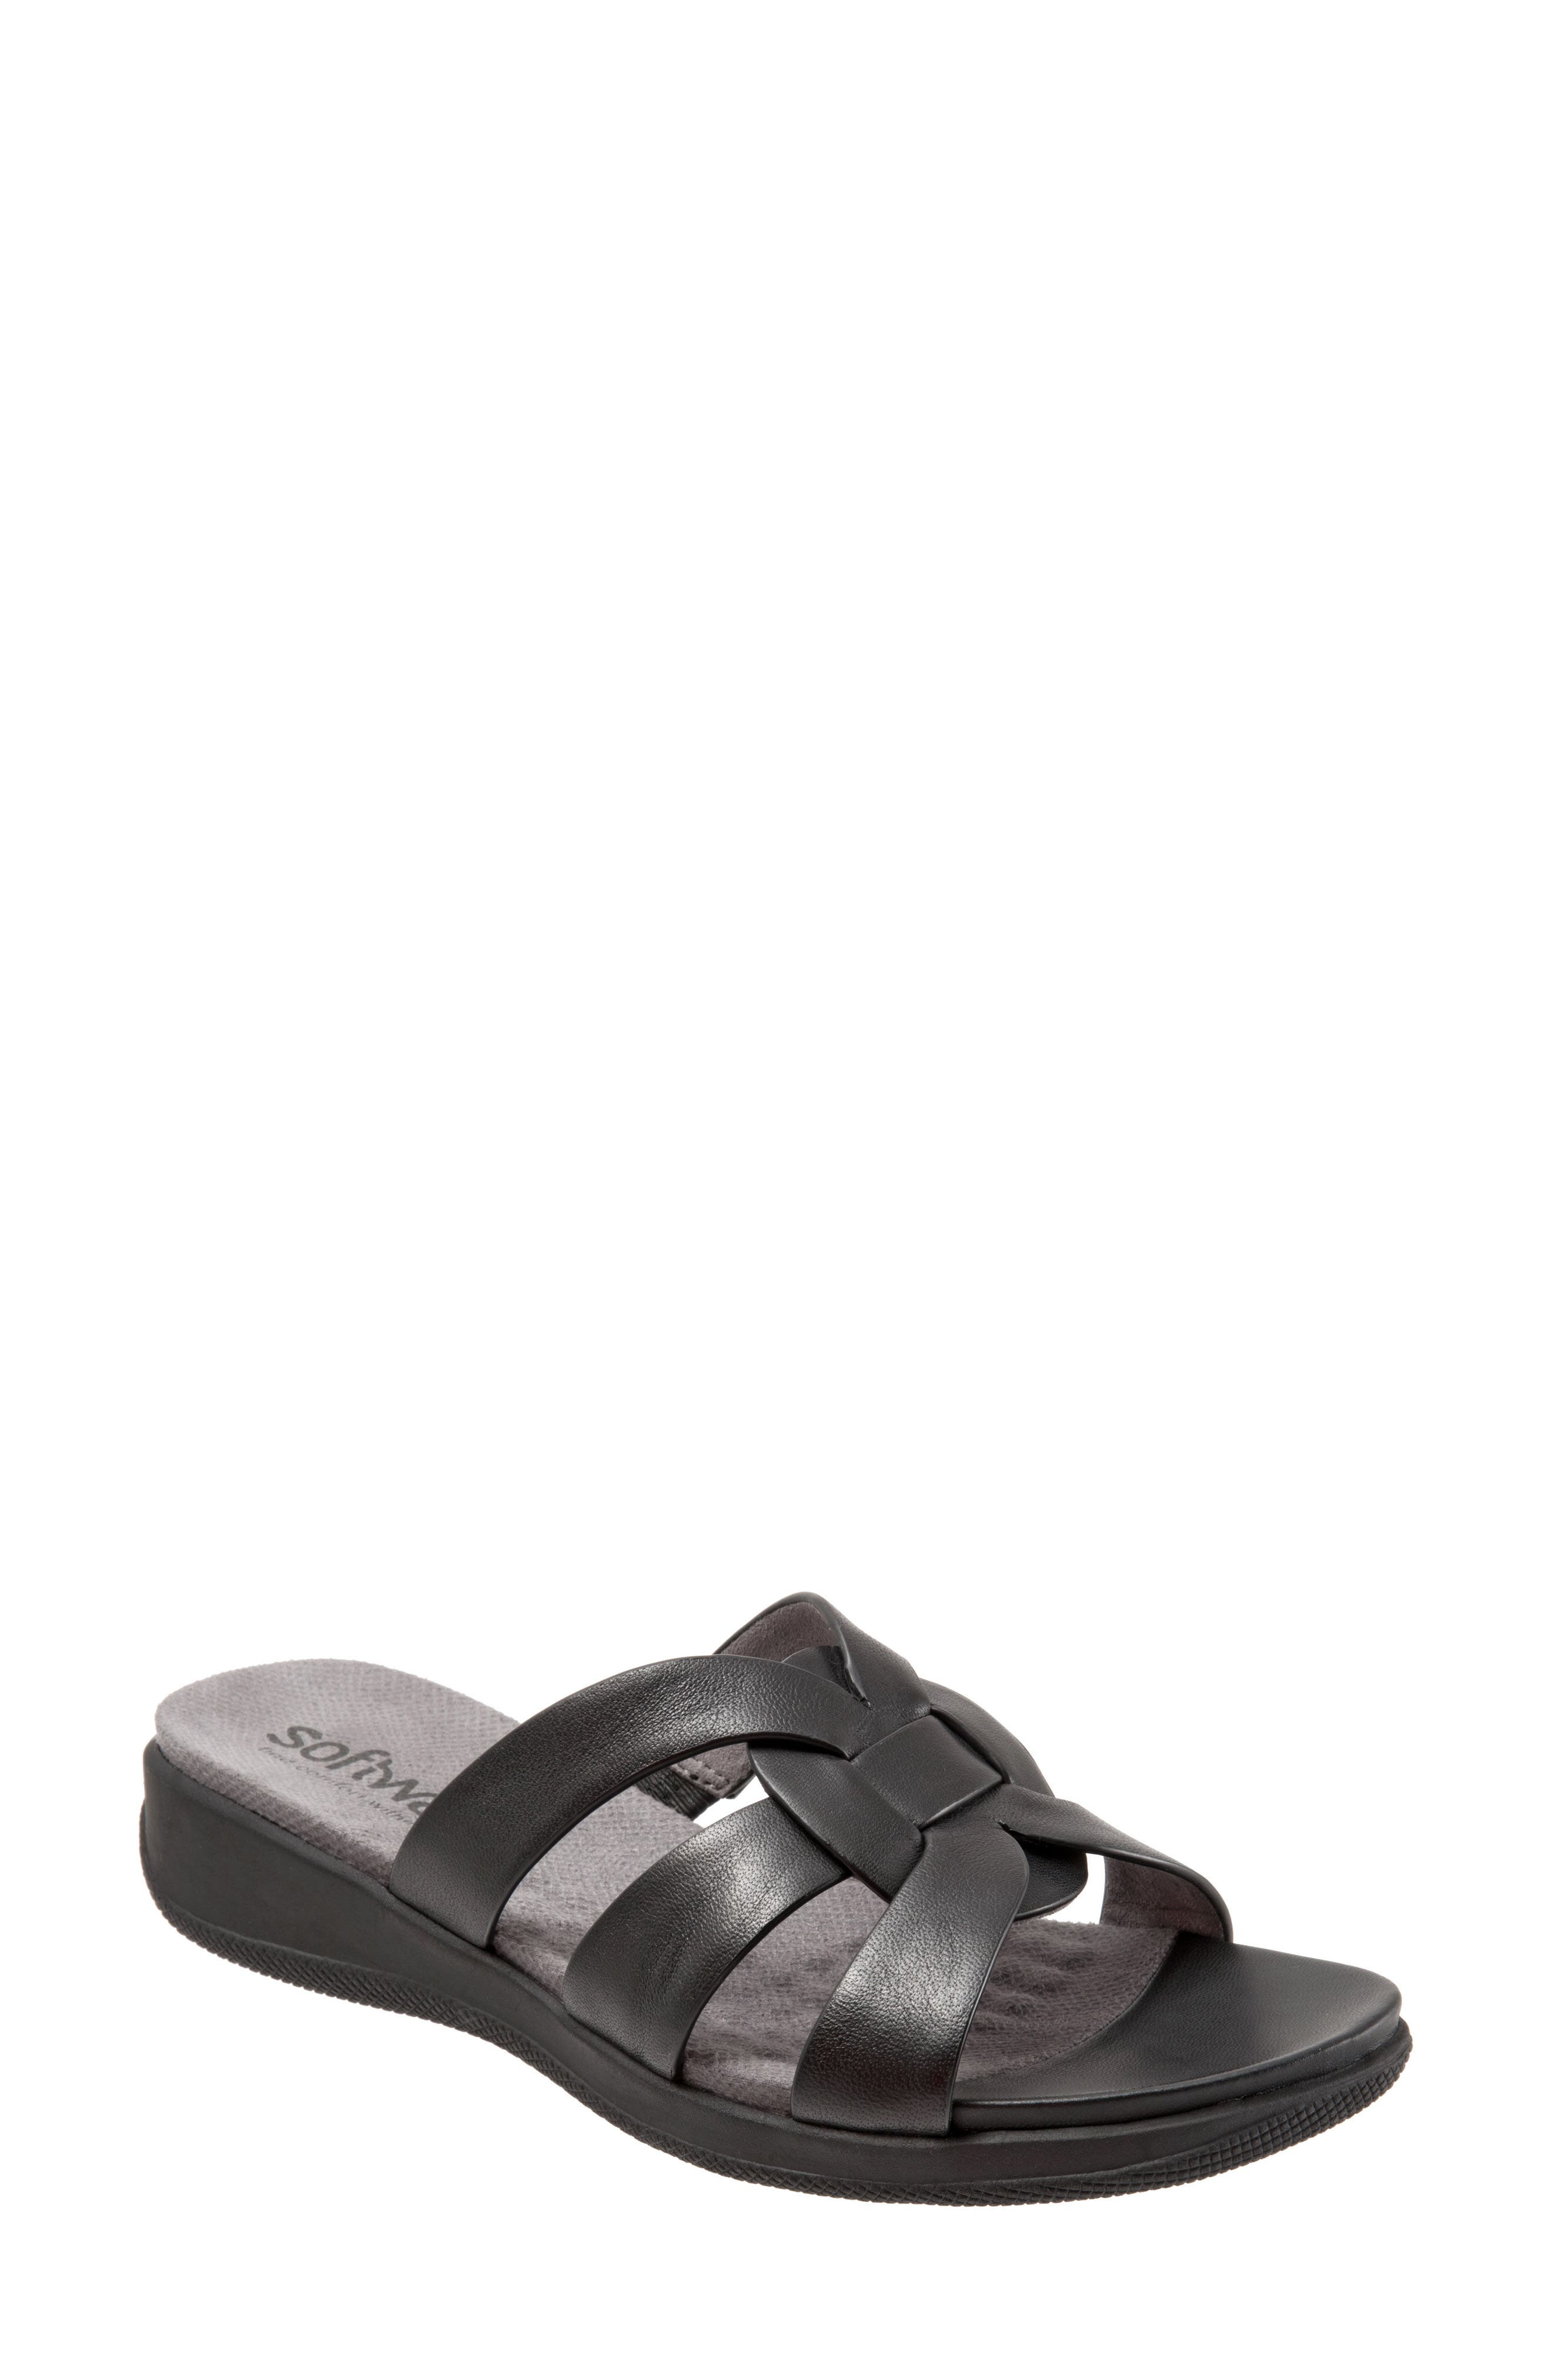 Thompson Slide Sandal,                         Main,                         color, Black Leather